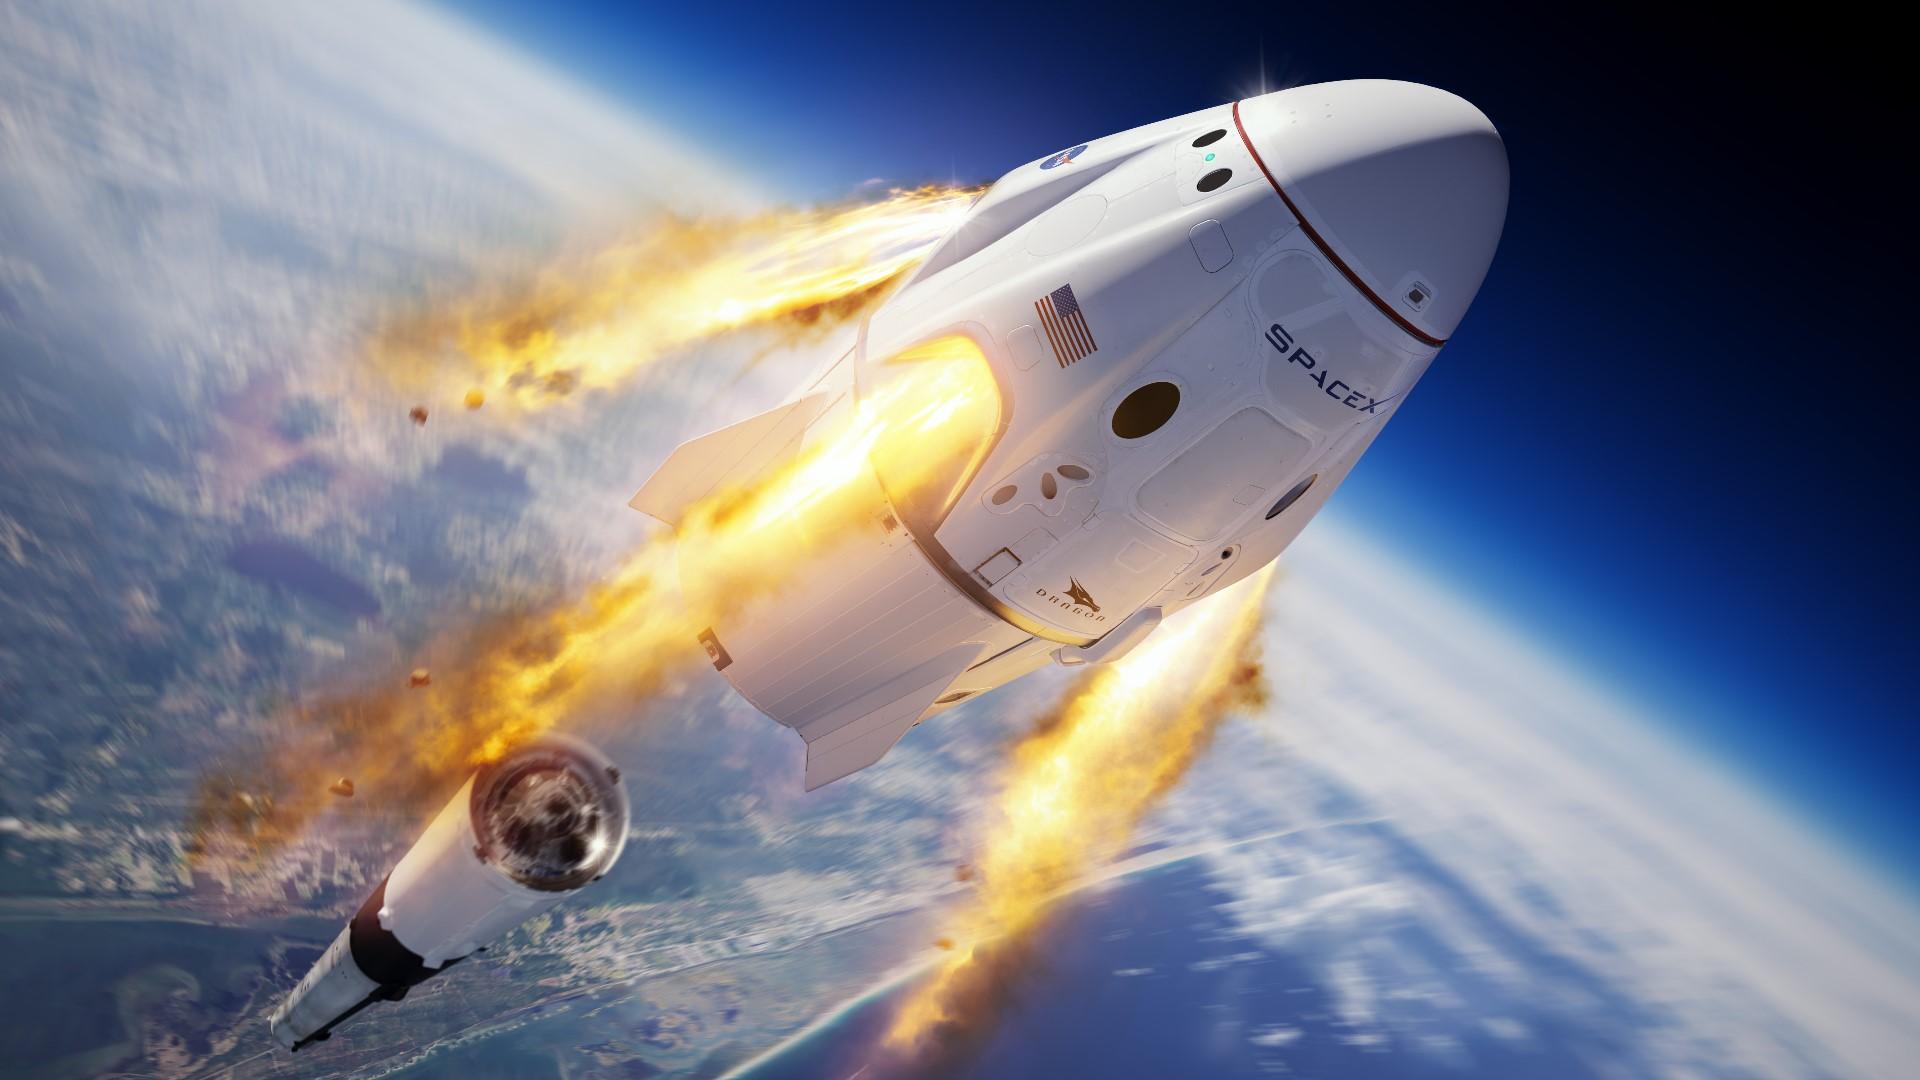 Roket Berhasil Meluncur, Ini yang Dikhawatirkan Elon Musk